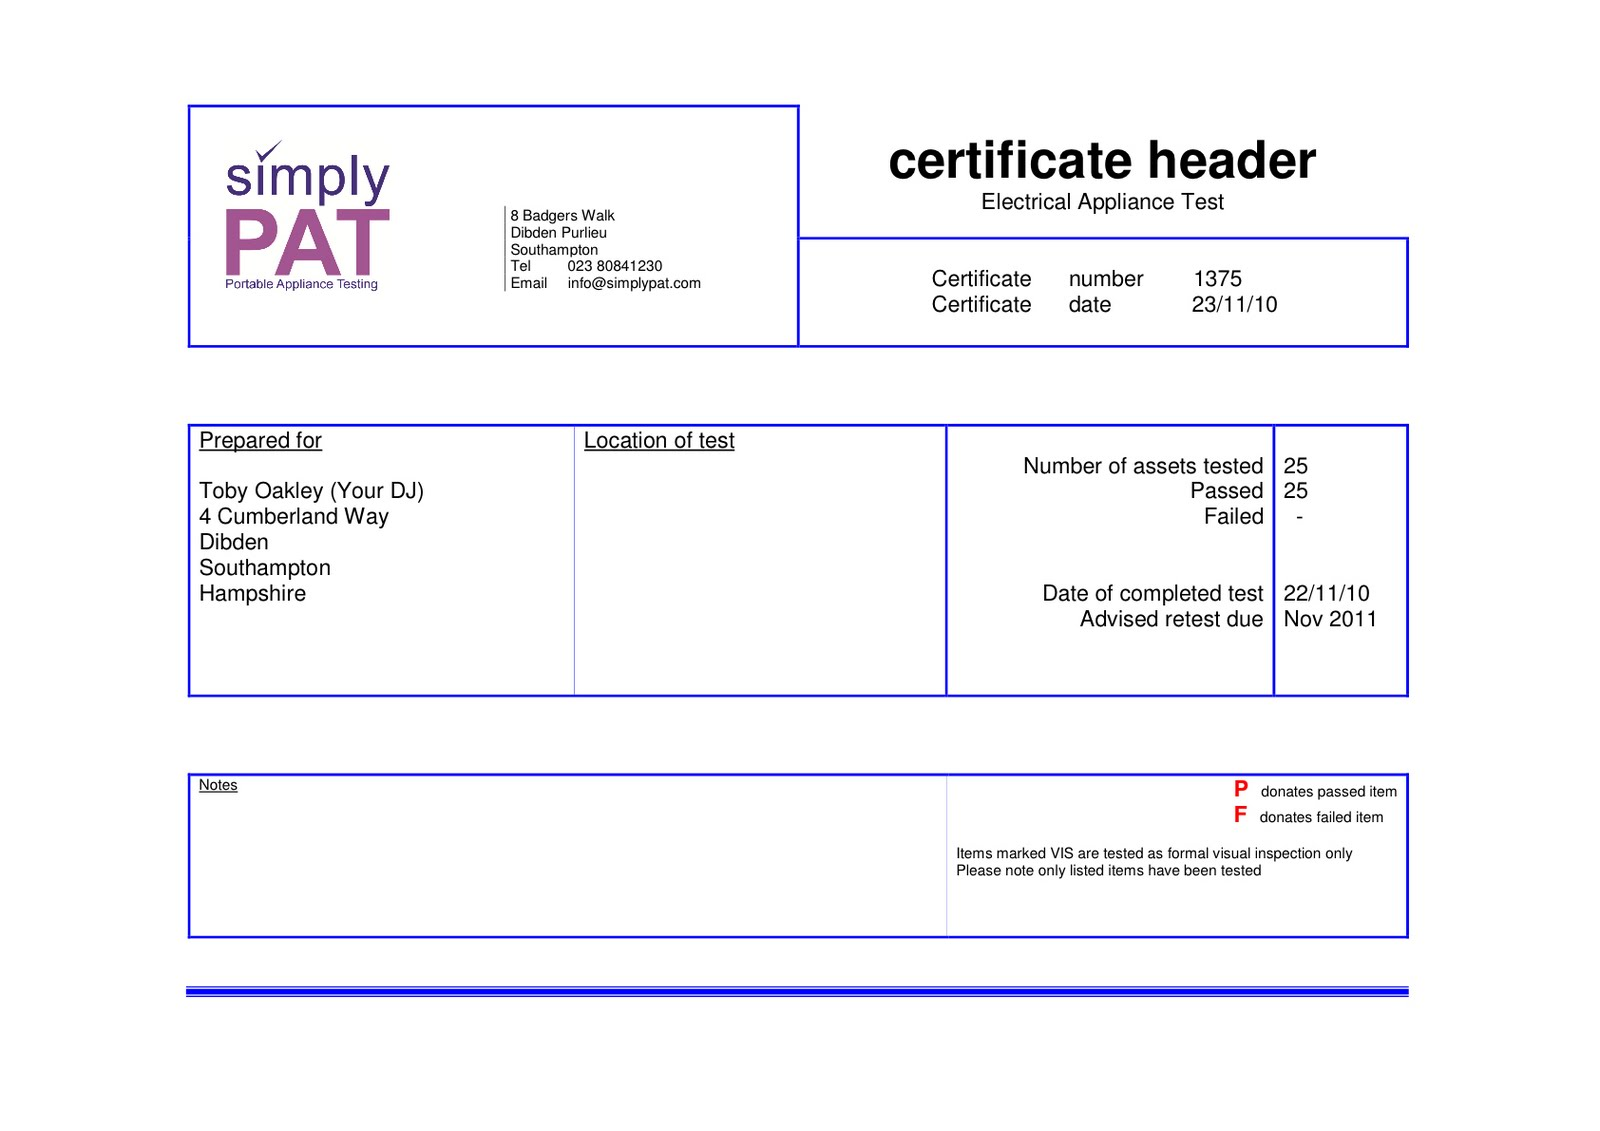 Public Liability (PLI) U0026 Portable Appliance Test (PAT) Certificates